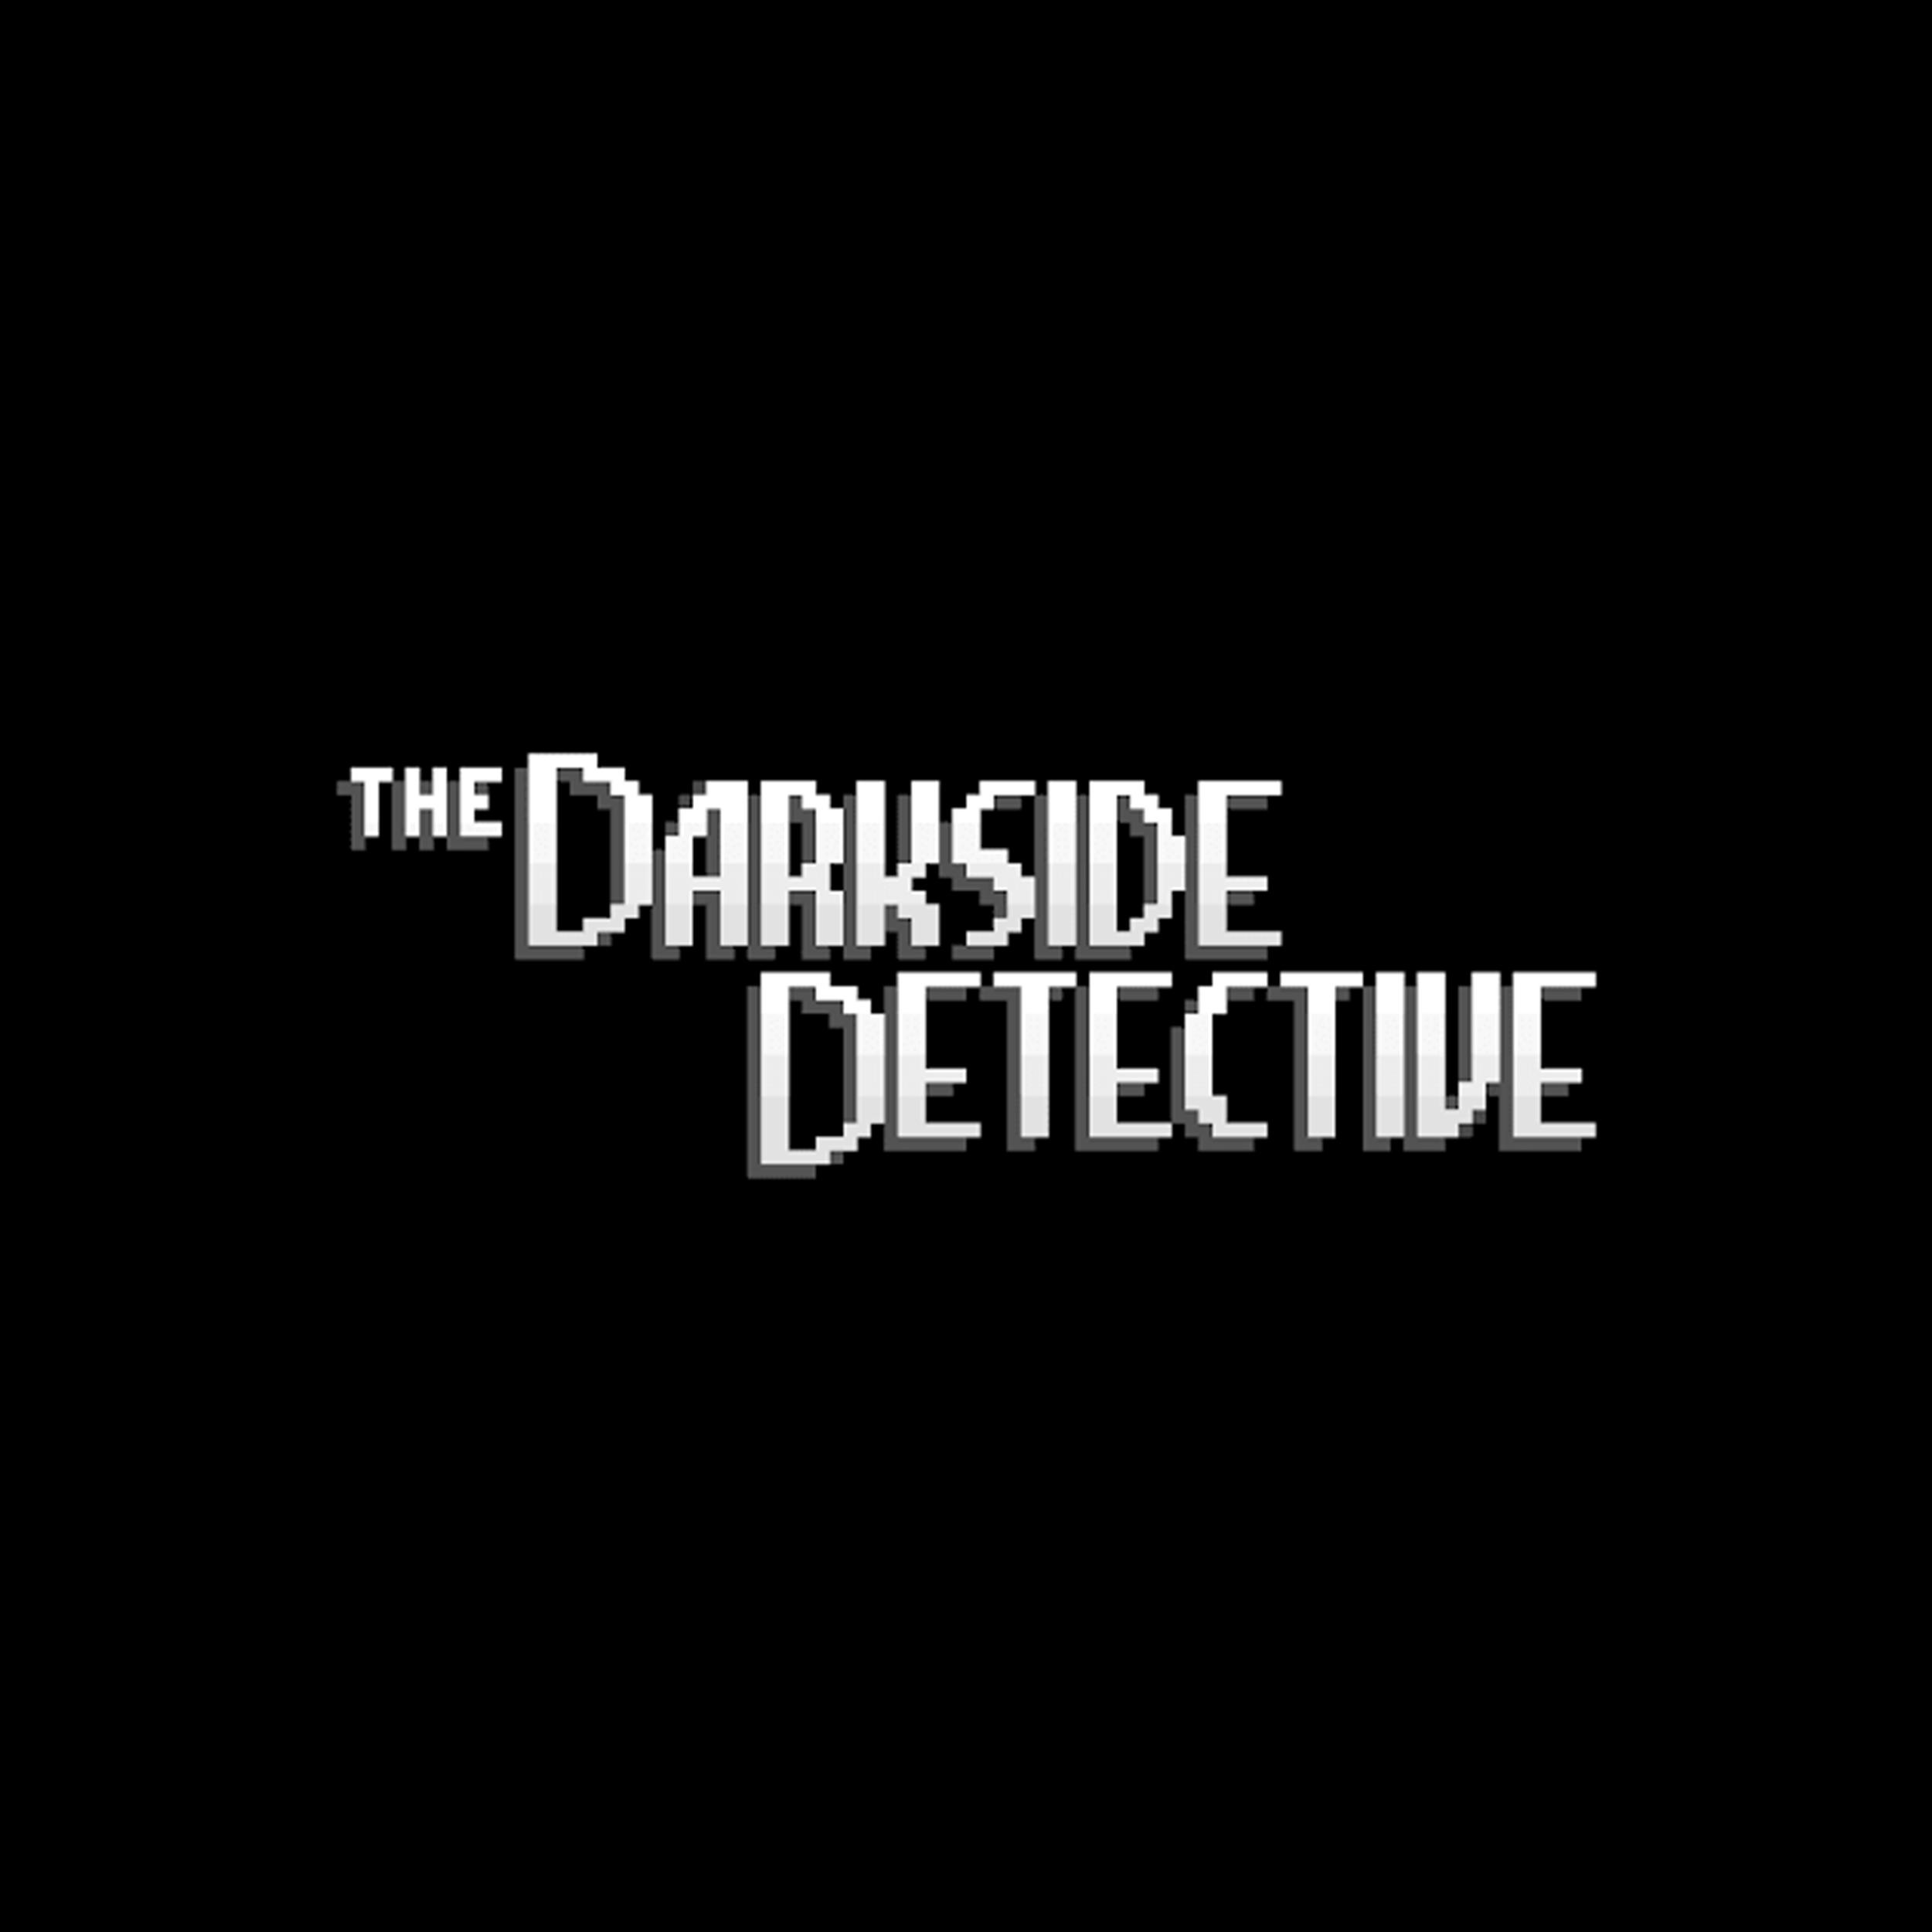 The Darkside Detective logo